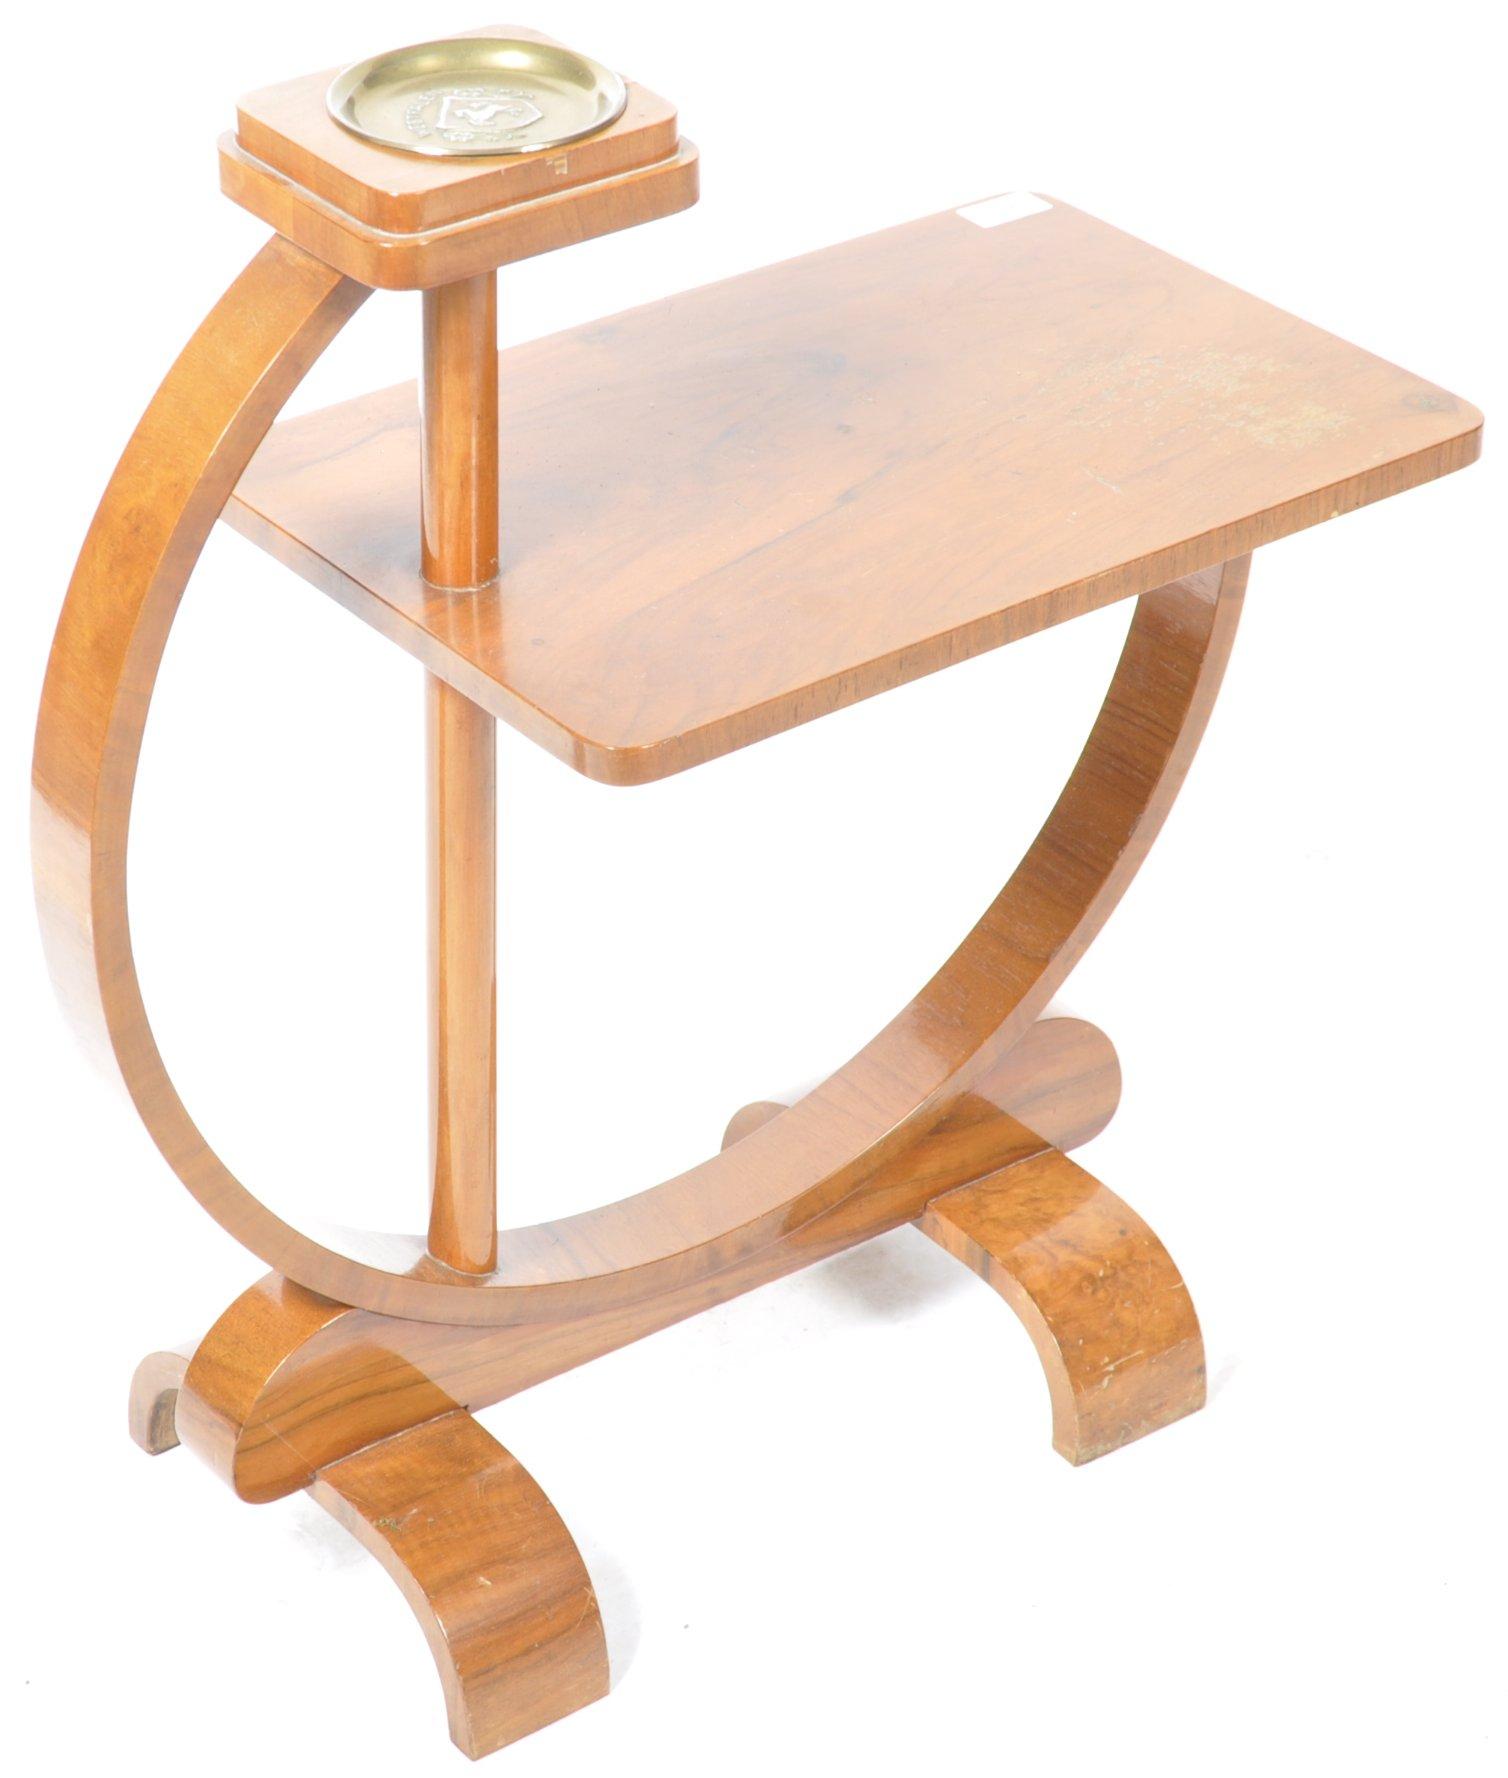 STUNNING ART DECO WALNUT SMOKER'S TABLE / SIDE TABLE - Image 2 of 4